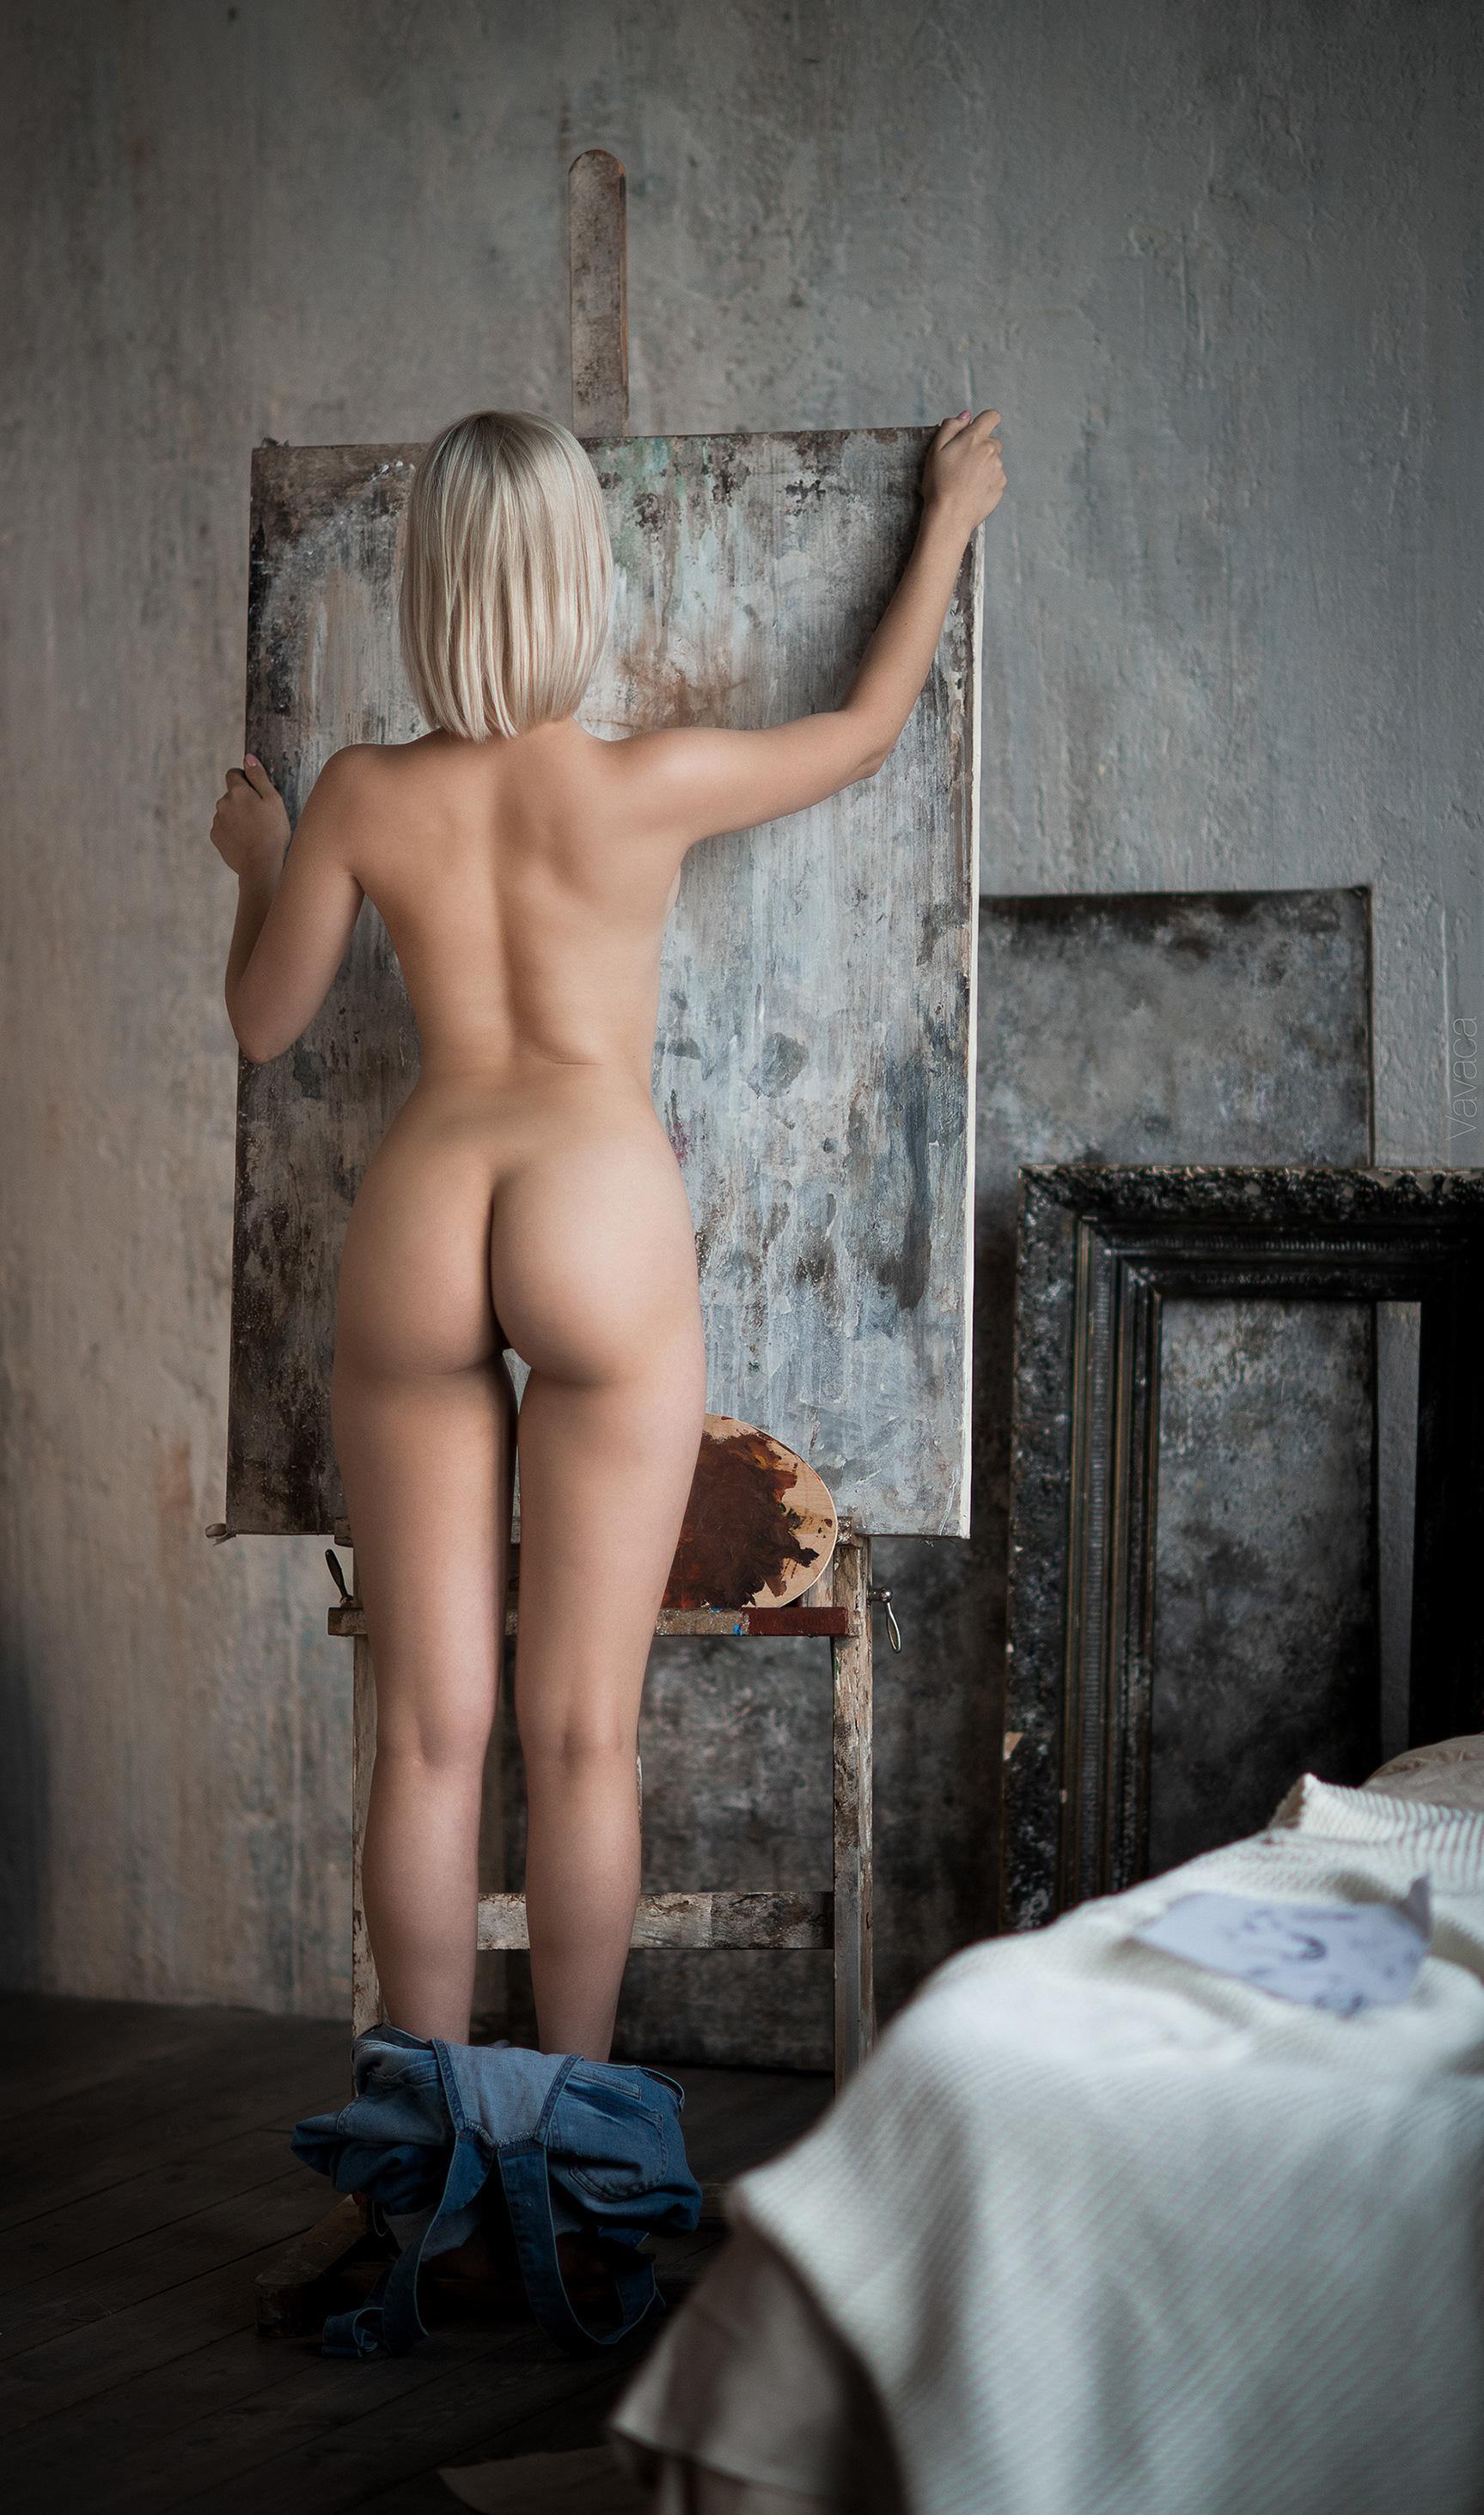 В мастерской художника / Victoria Sokolova nude by Vladimir Nikolaev / Artist's cave